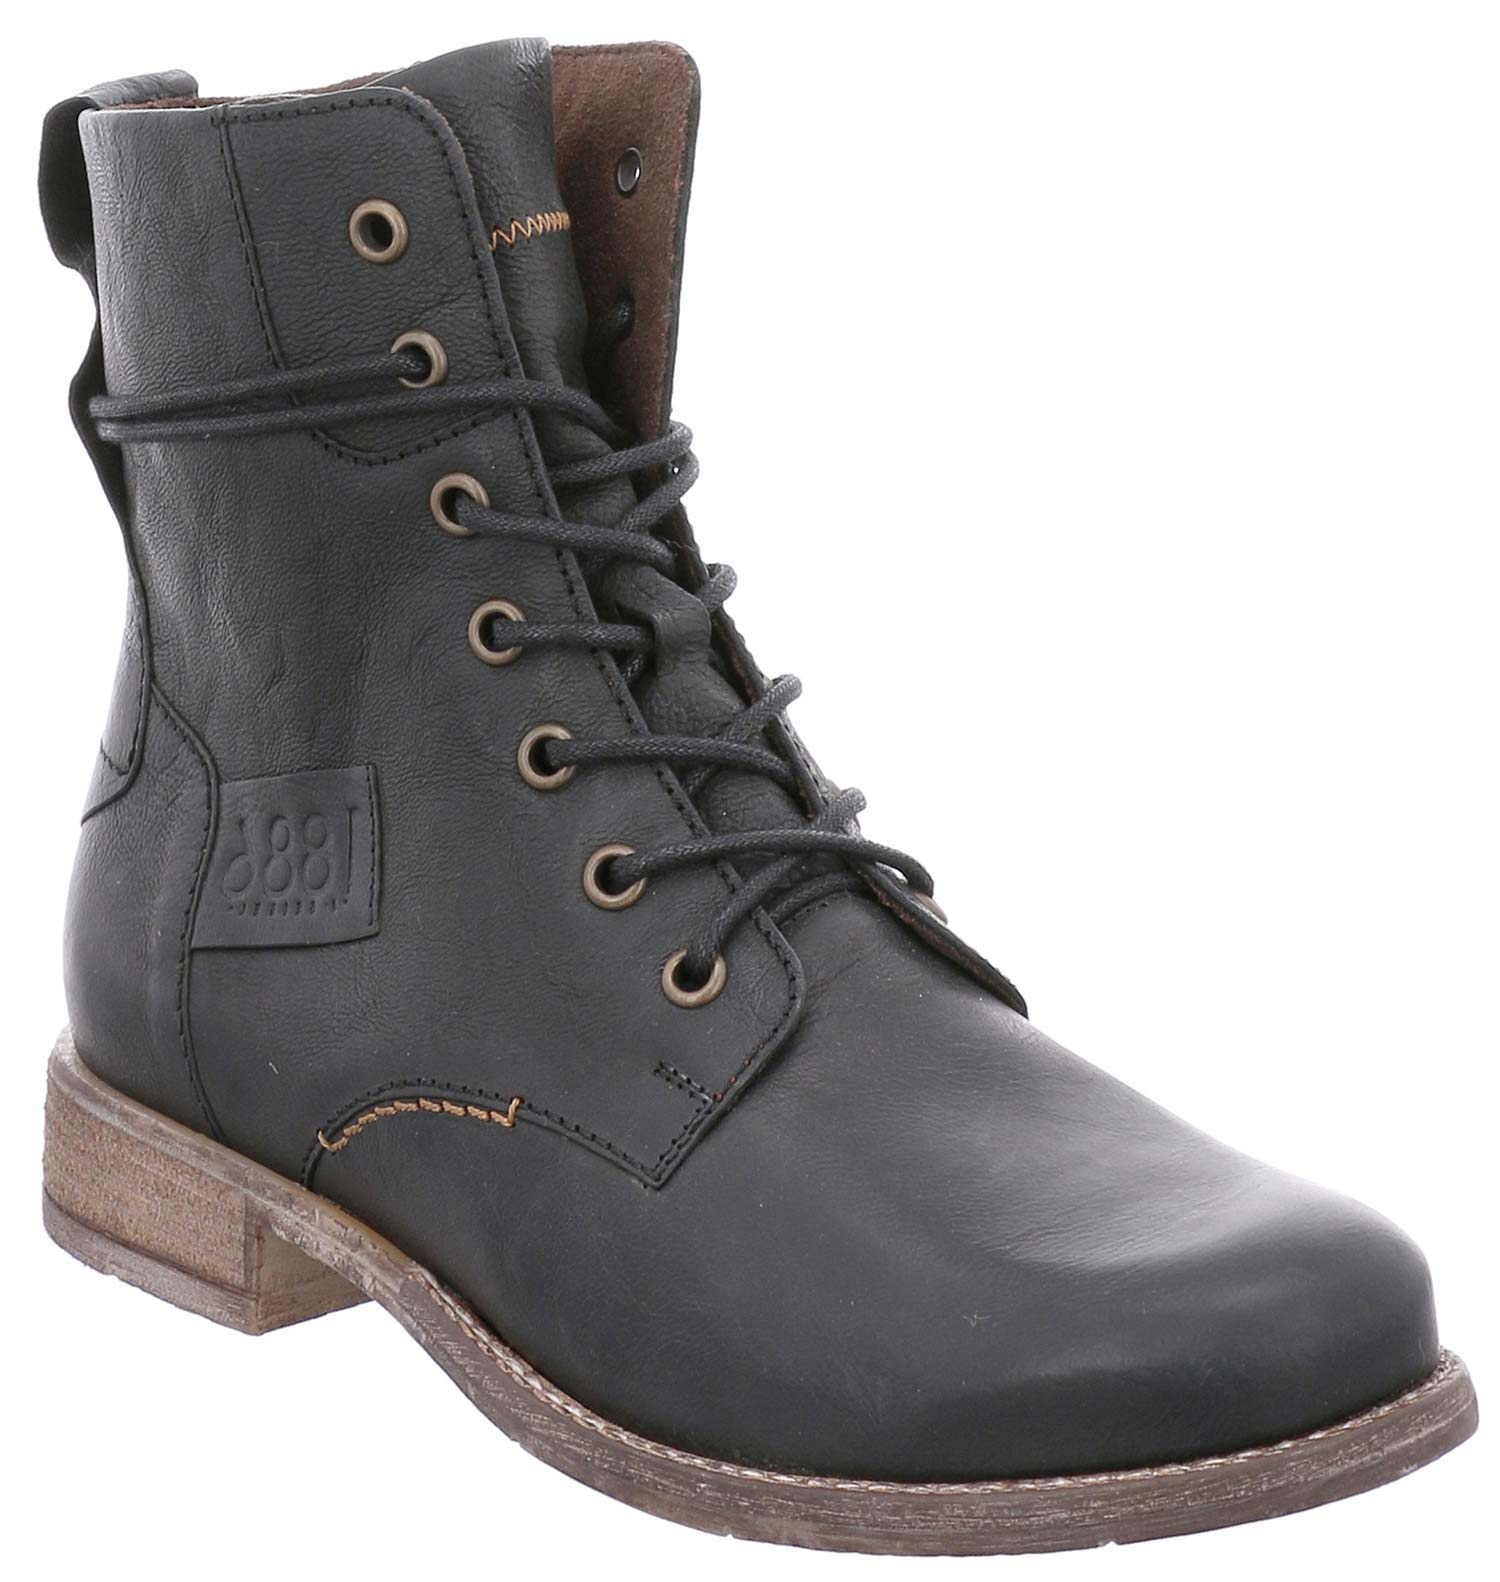 Josef Seibel Sienna Ladies Winter shoes Boots 99663mi720 100 Black New